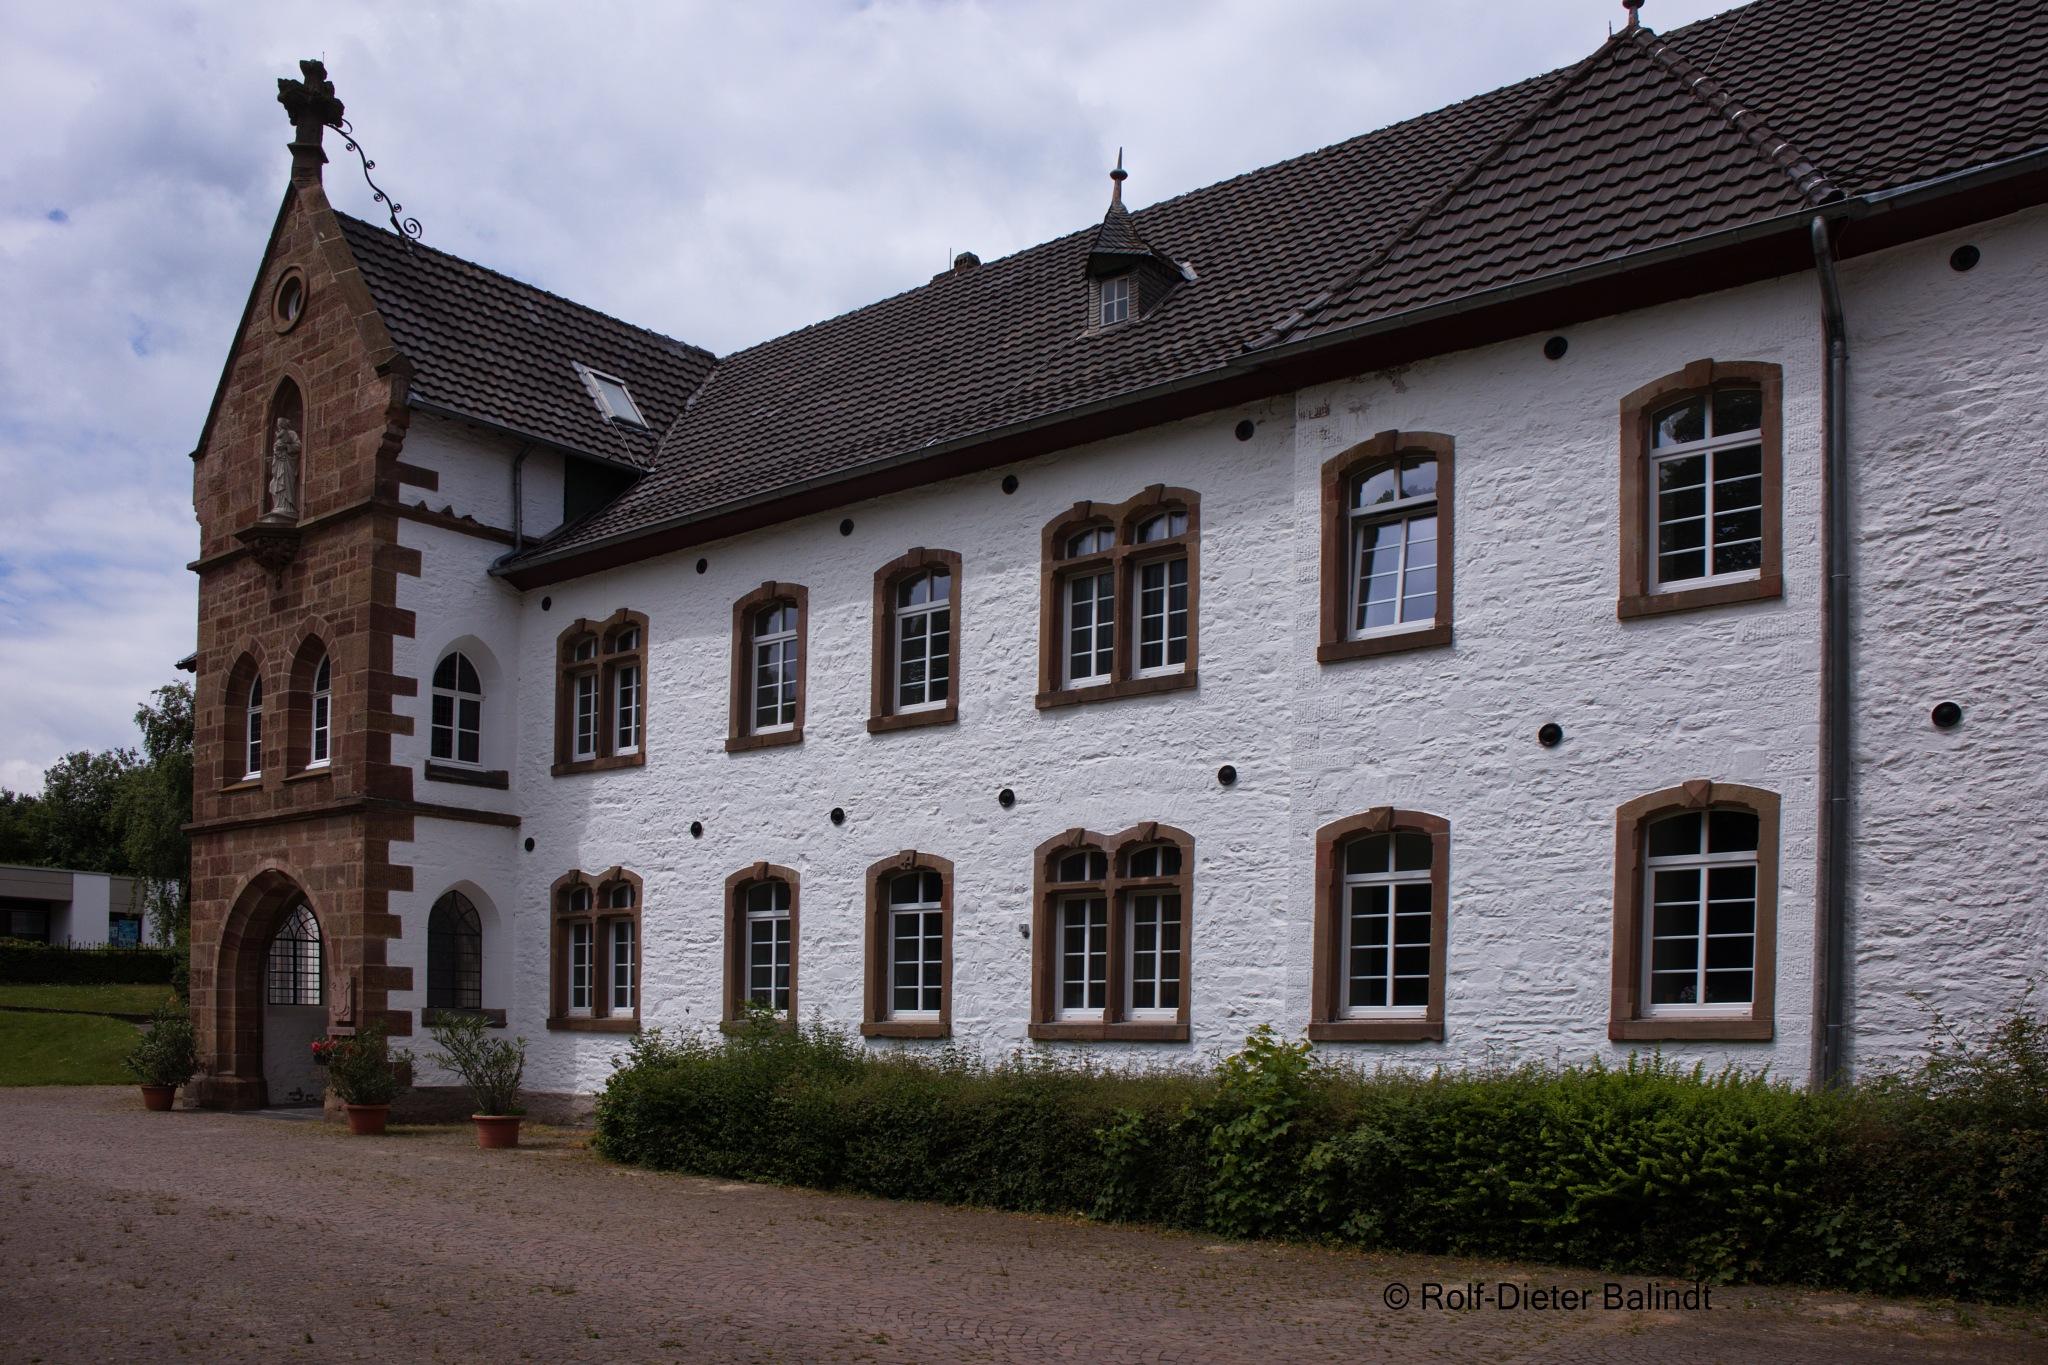 Marienwald by Rolf-Dieter Balindt